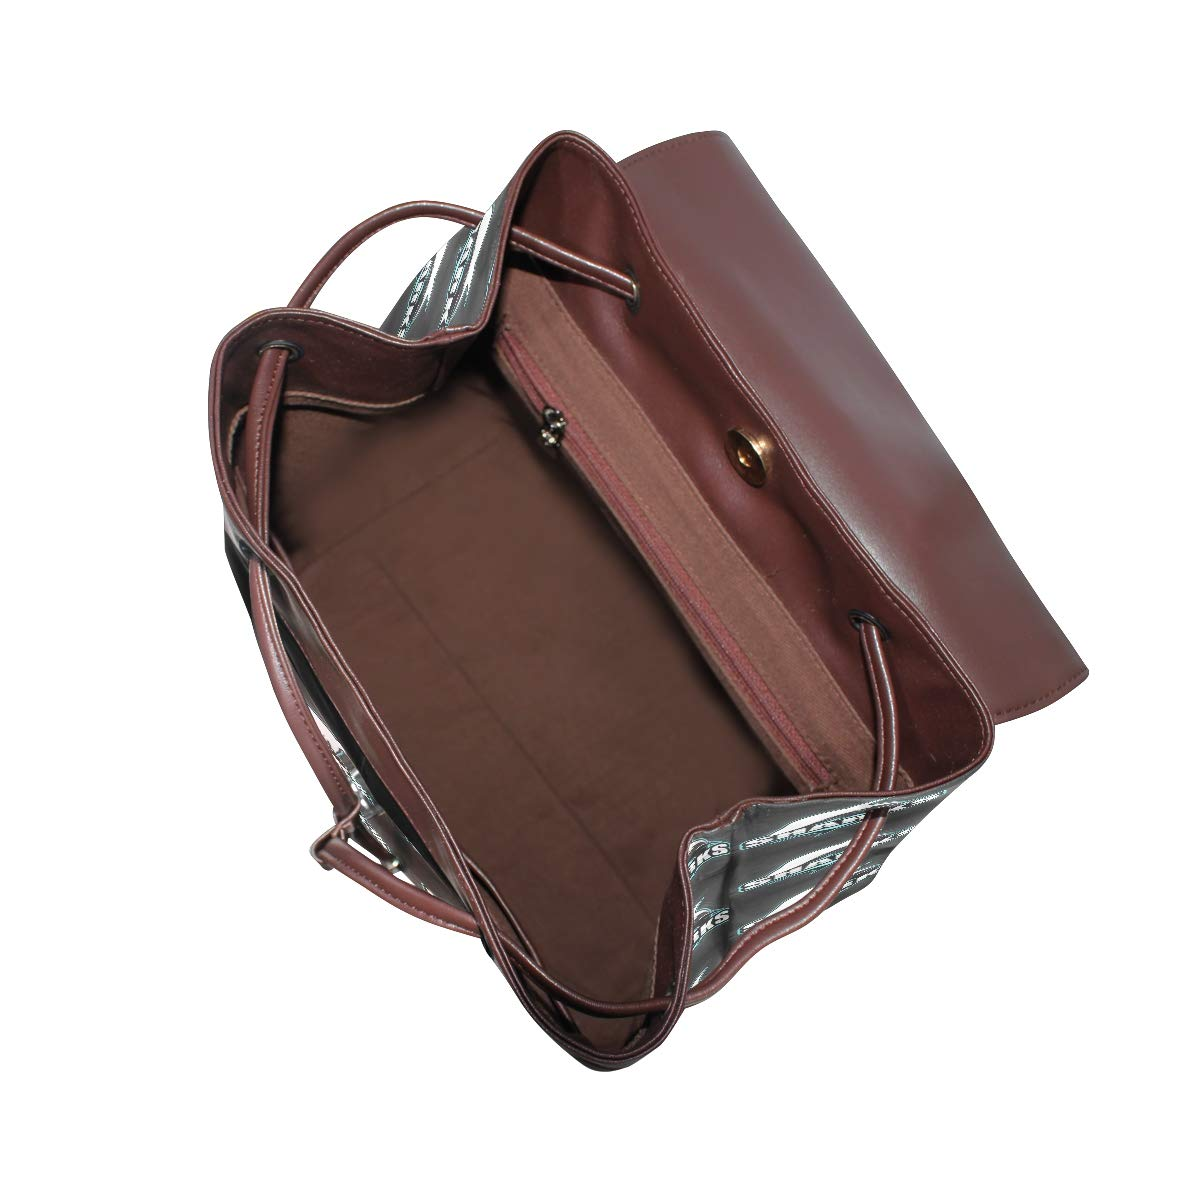 Leather fashion Shark Logo For Sport Team backpack For Work//Travel//Leisure//school bag